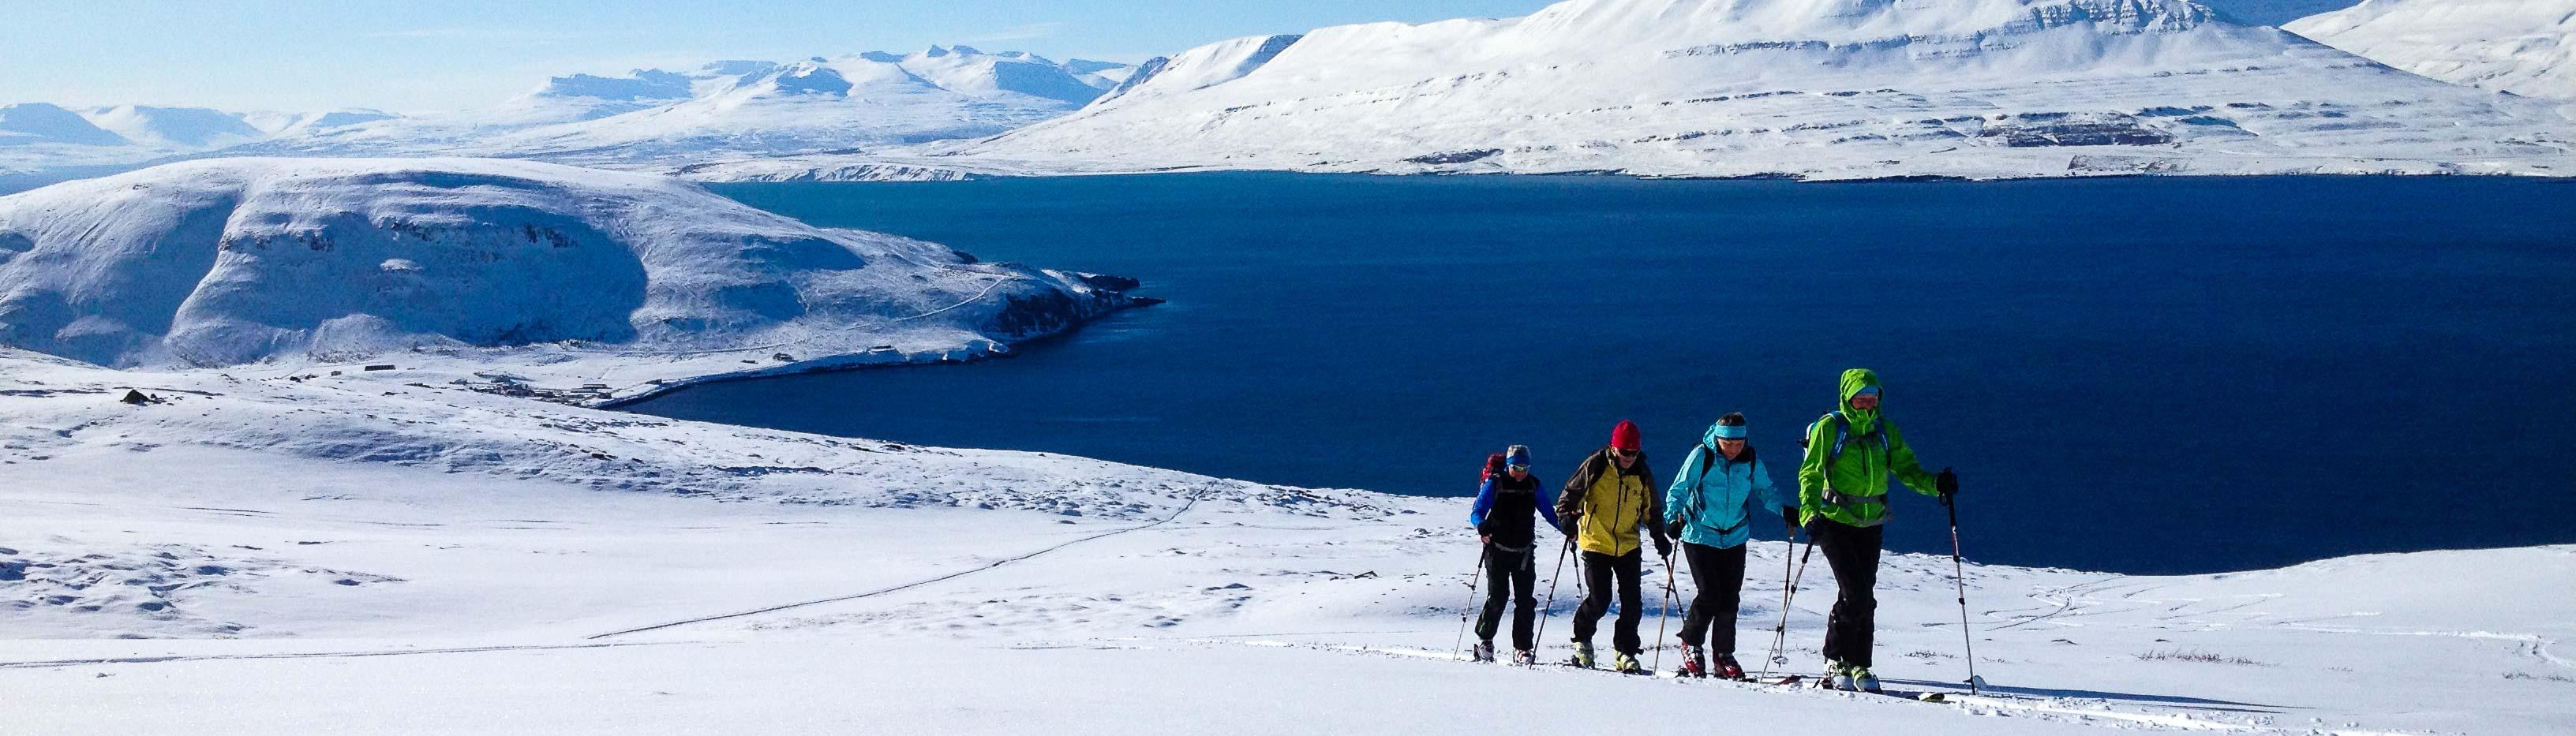 skiourenreise island